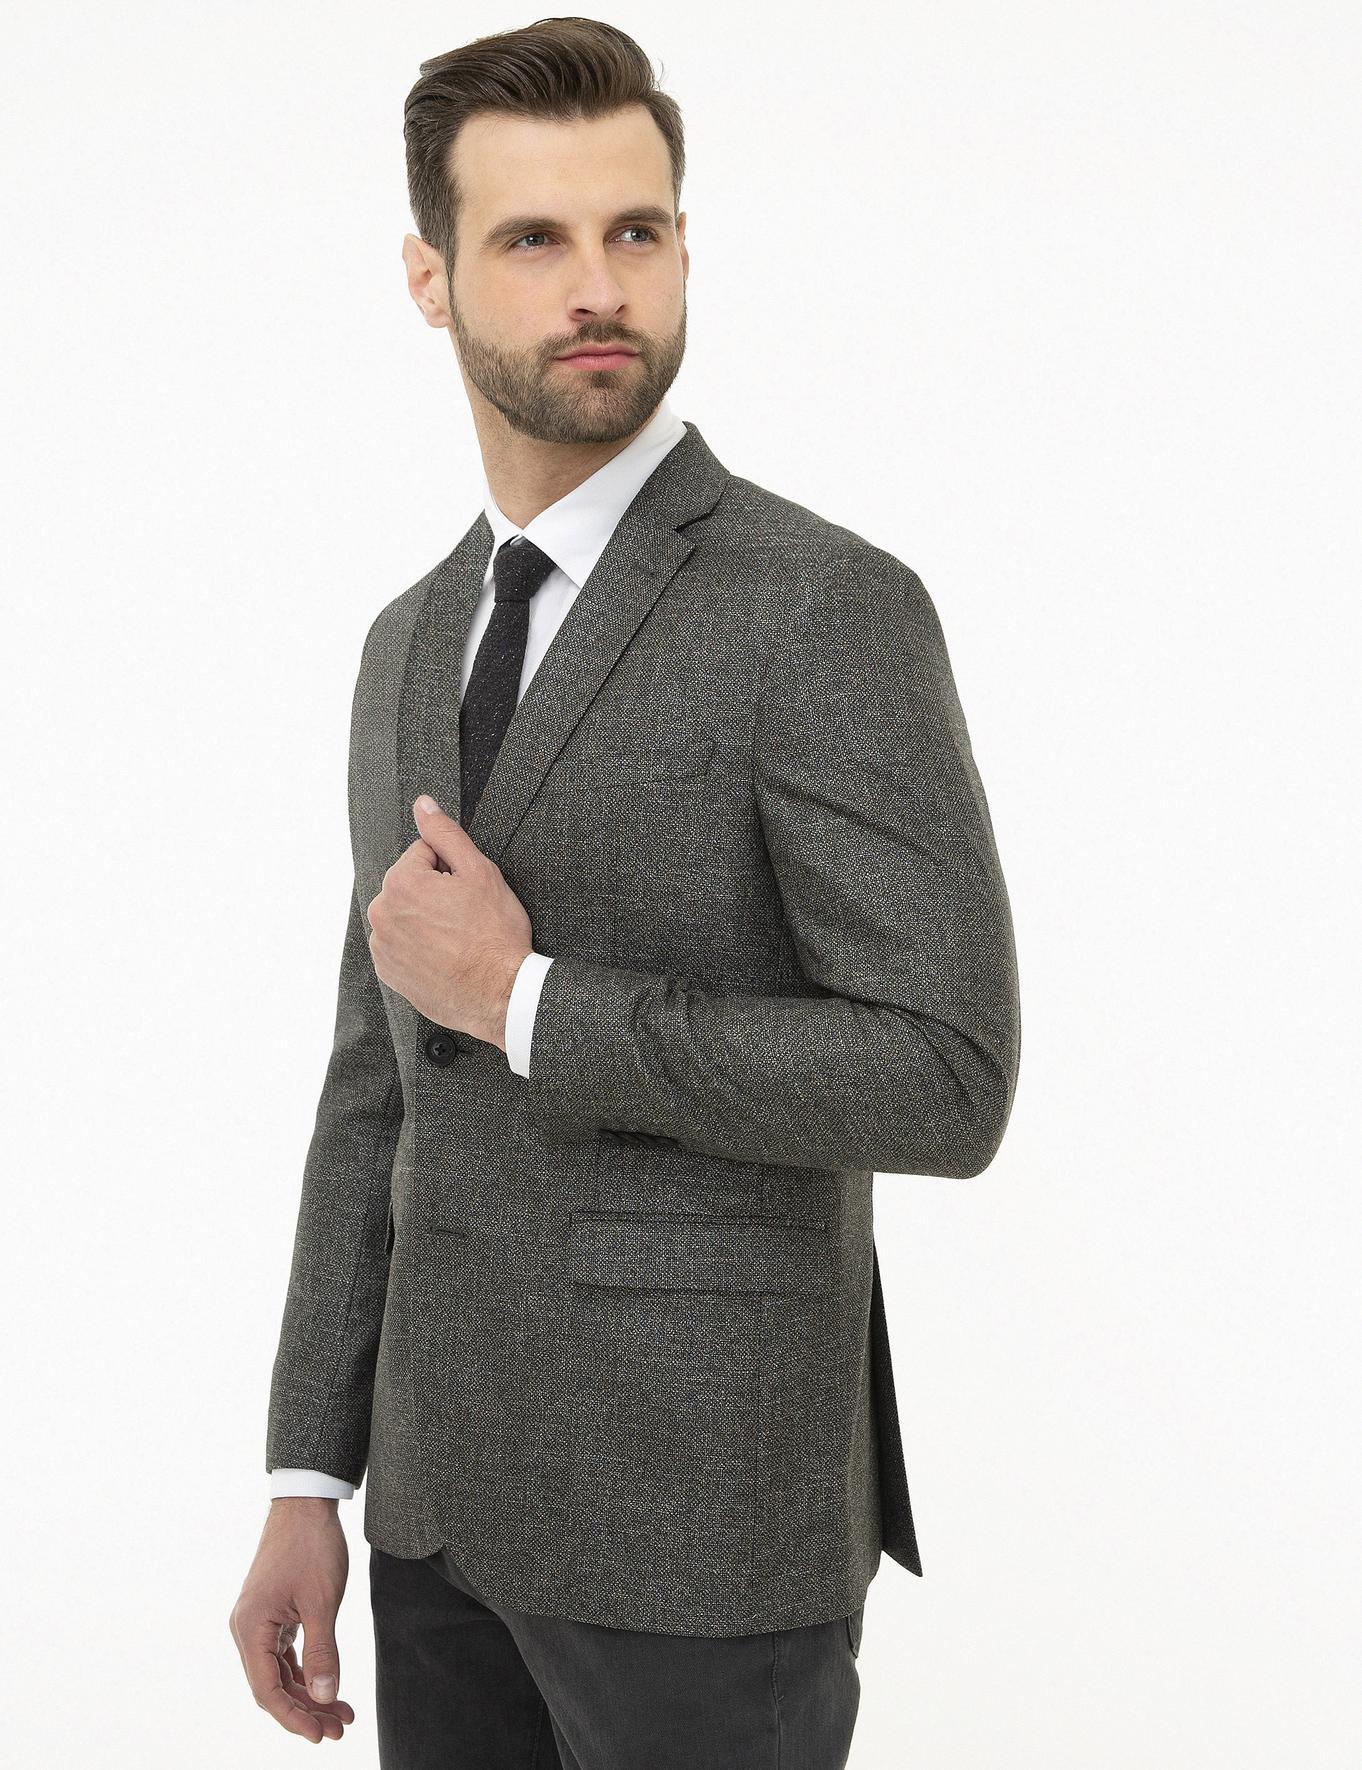 Antrasit Slim Fit Ceket